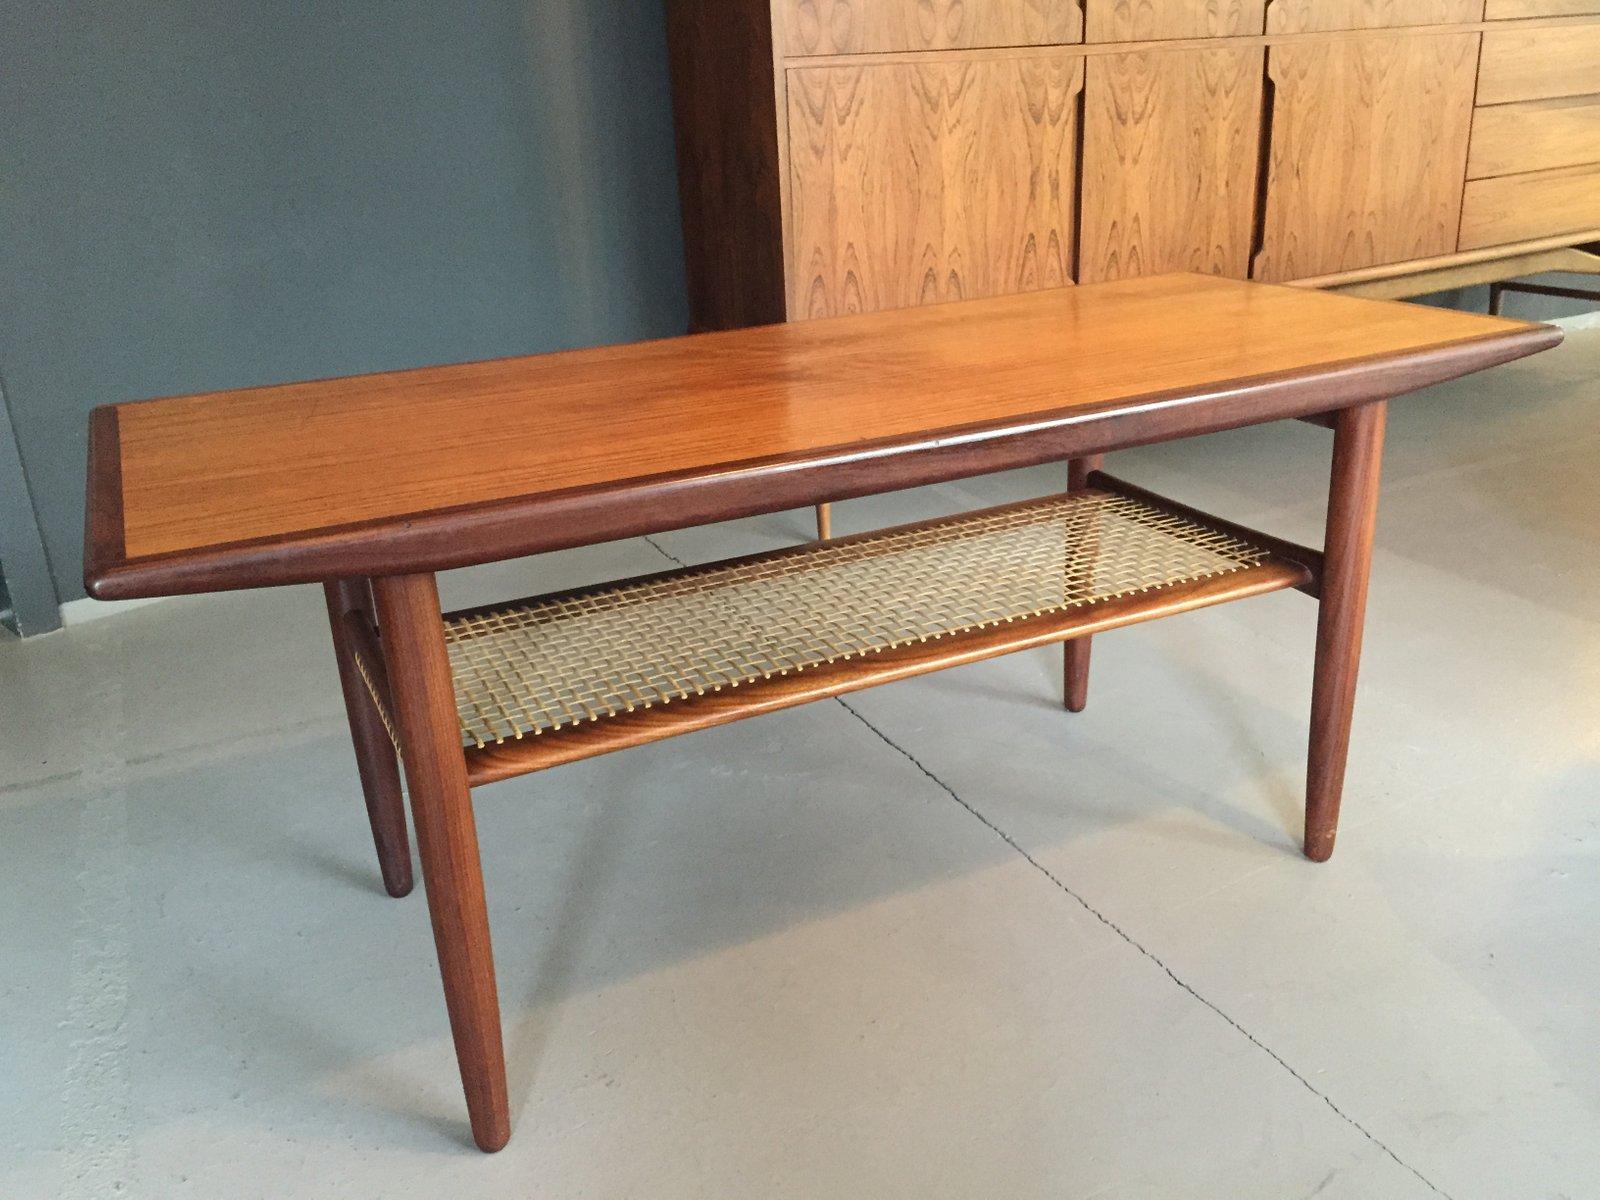 Danish Teak Coffee Table From C F Christensen A S 1960